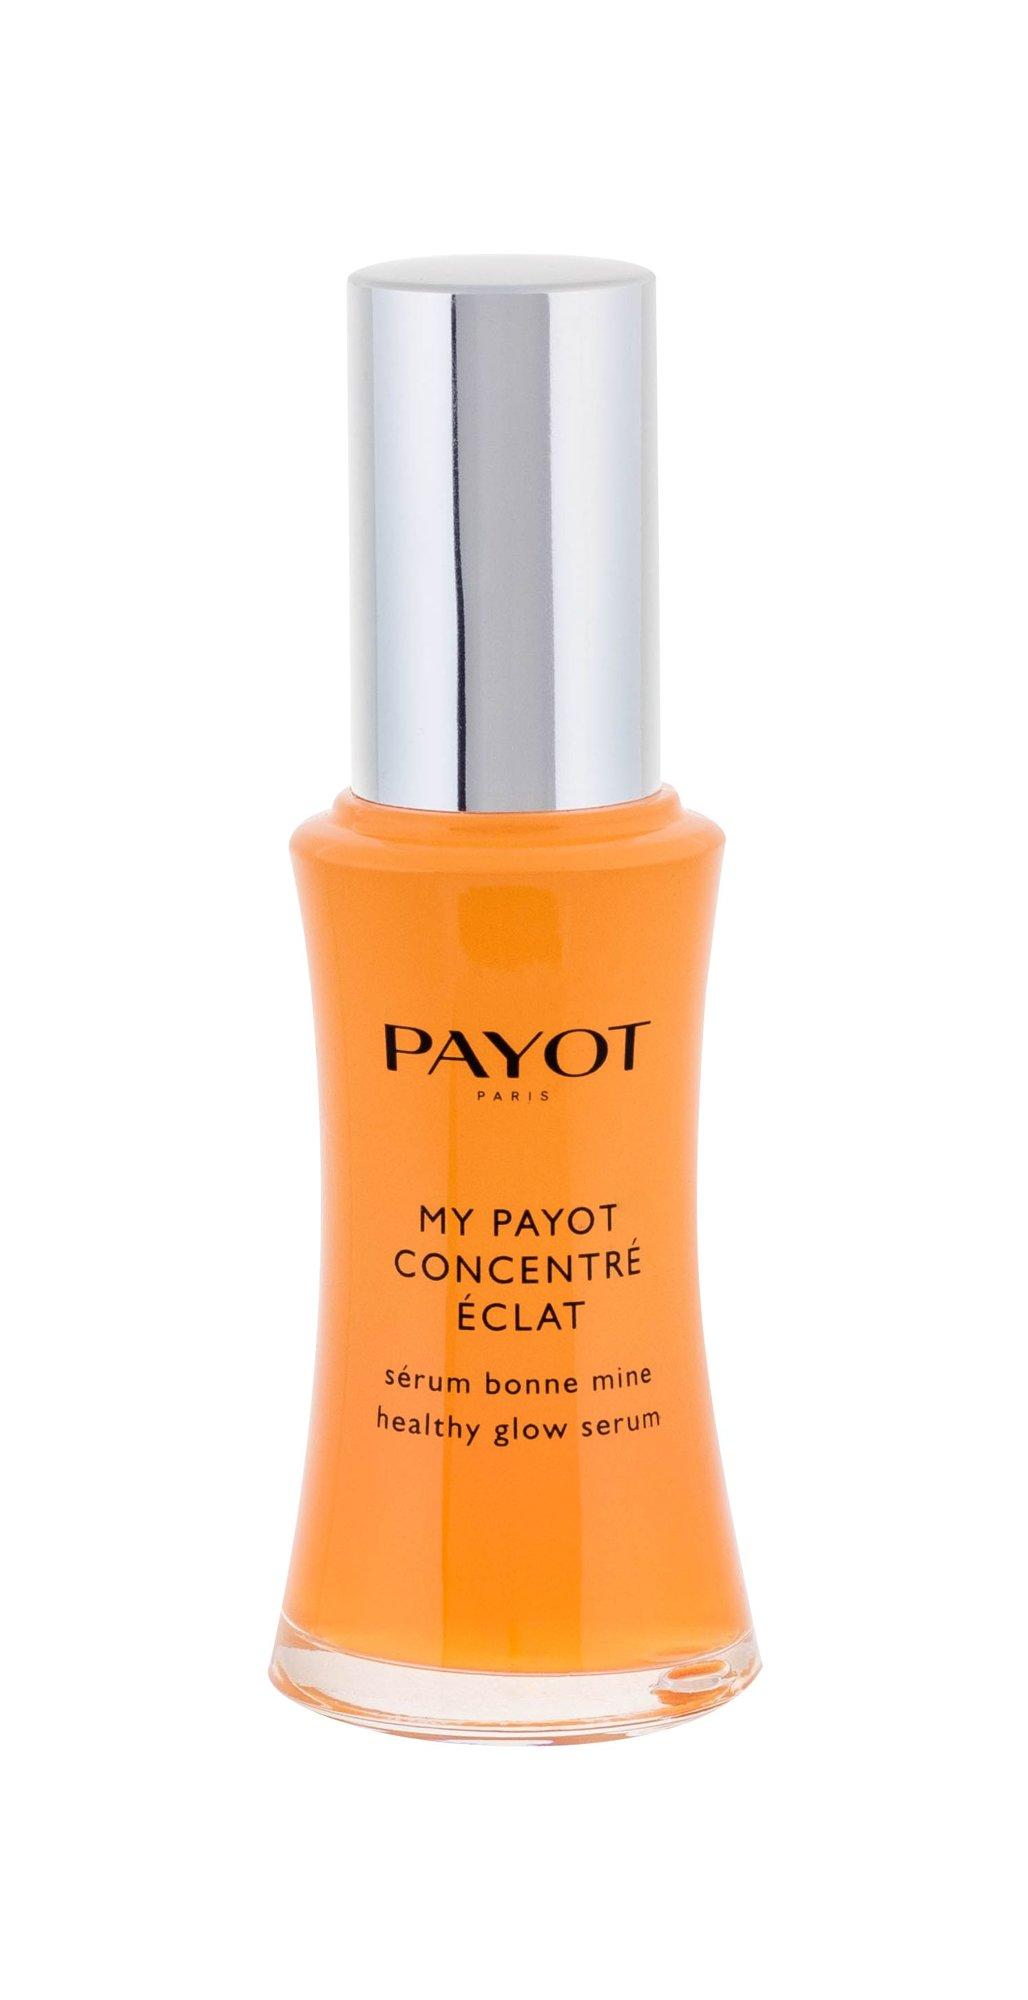 PAYOT My Payot Skin Serum 30ml  Concentré Éclat